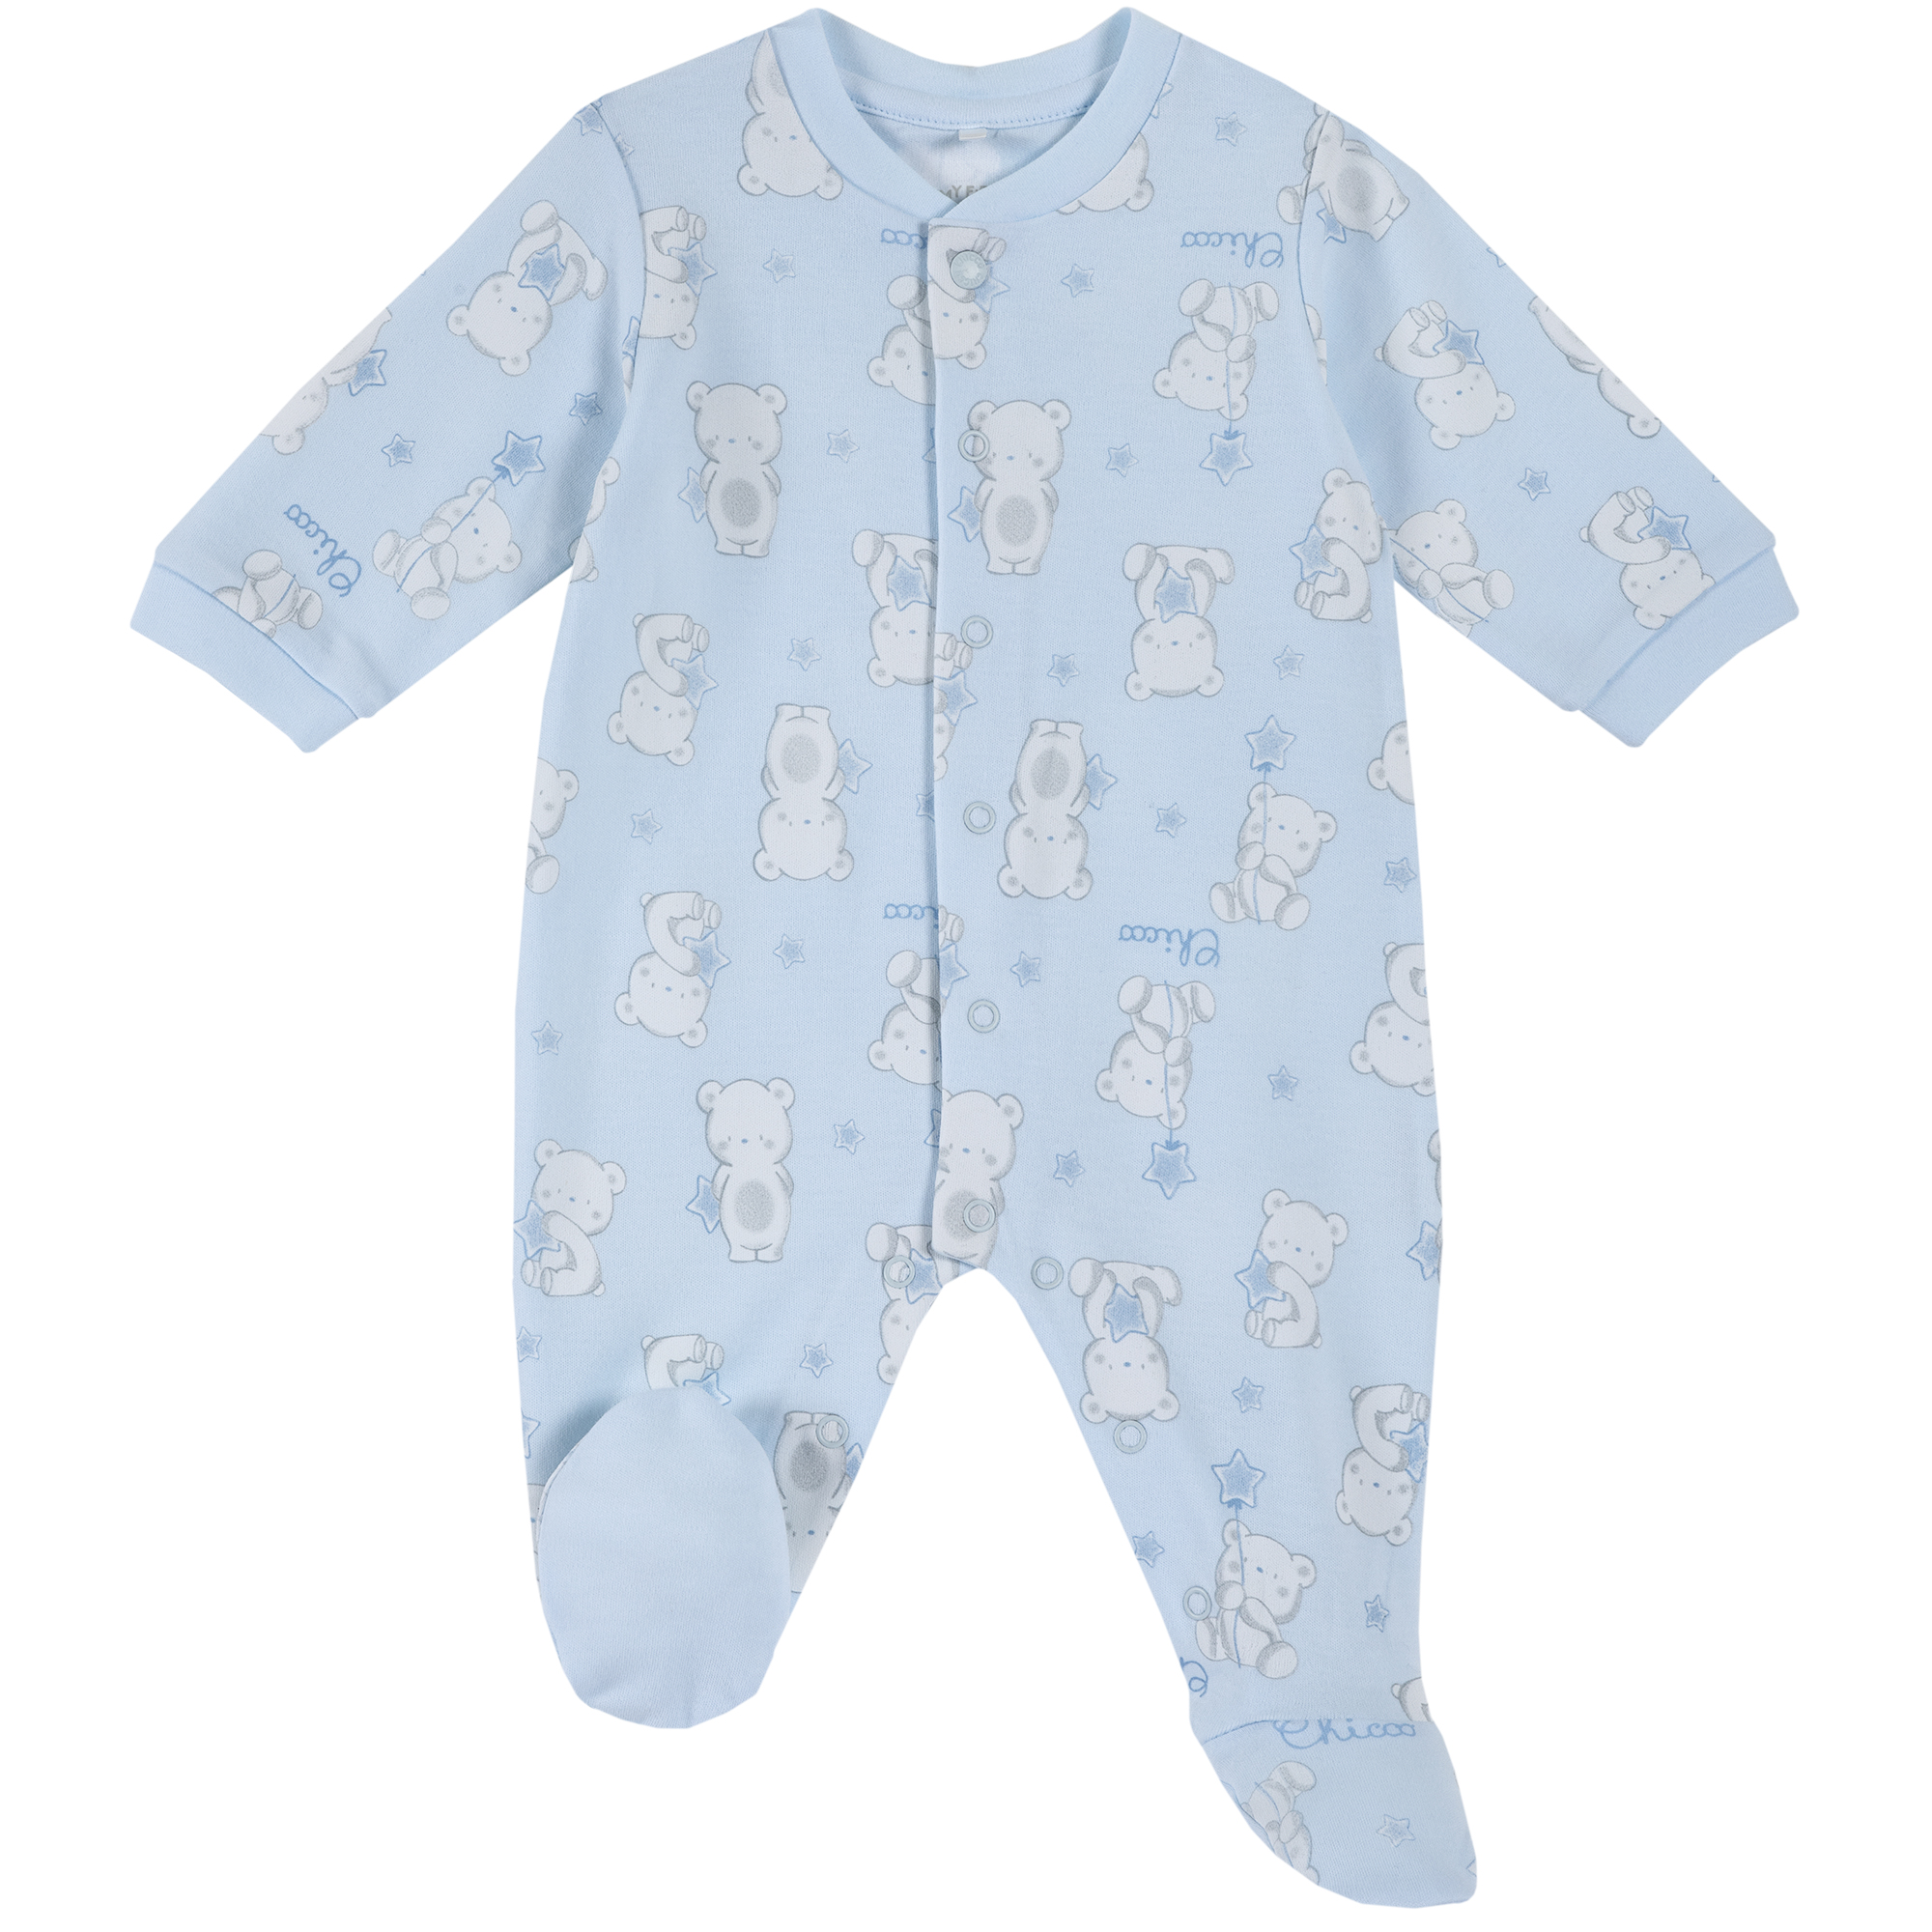 Salopeta copii Chicco, bleu, imprimeu ursuleti, 21862 din categoria Salopete/Body